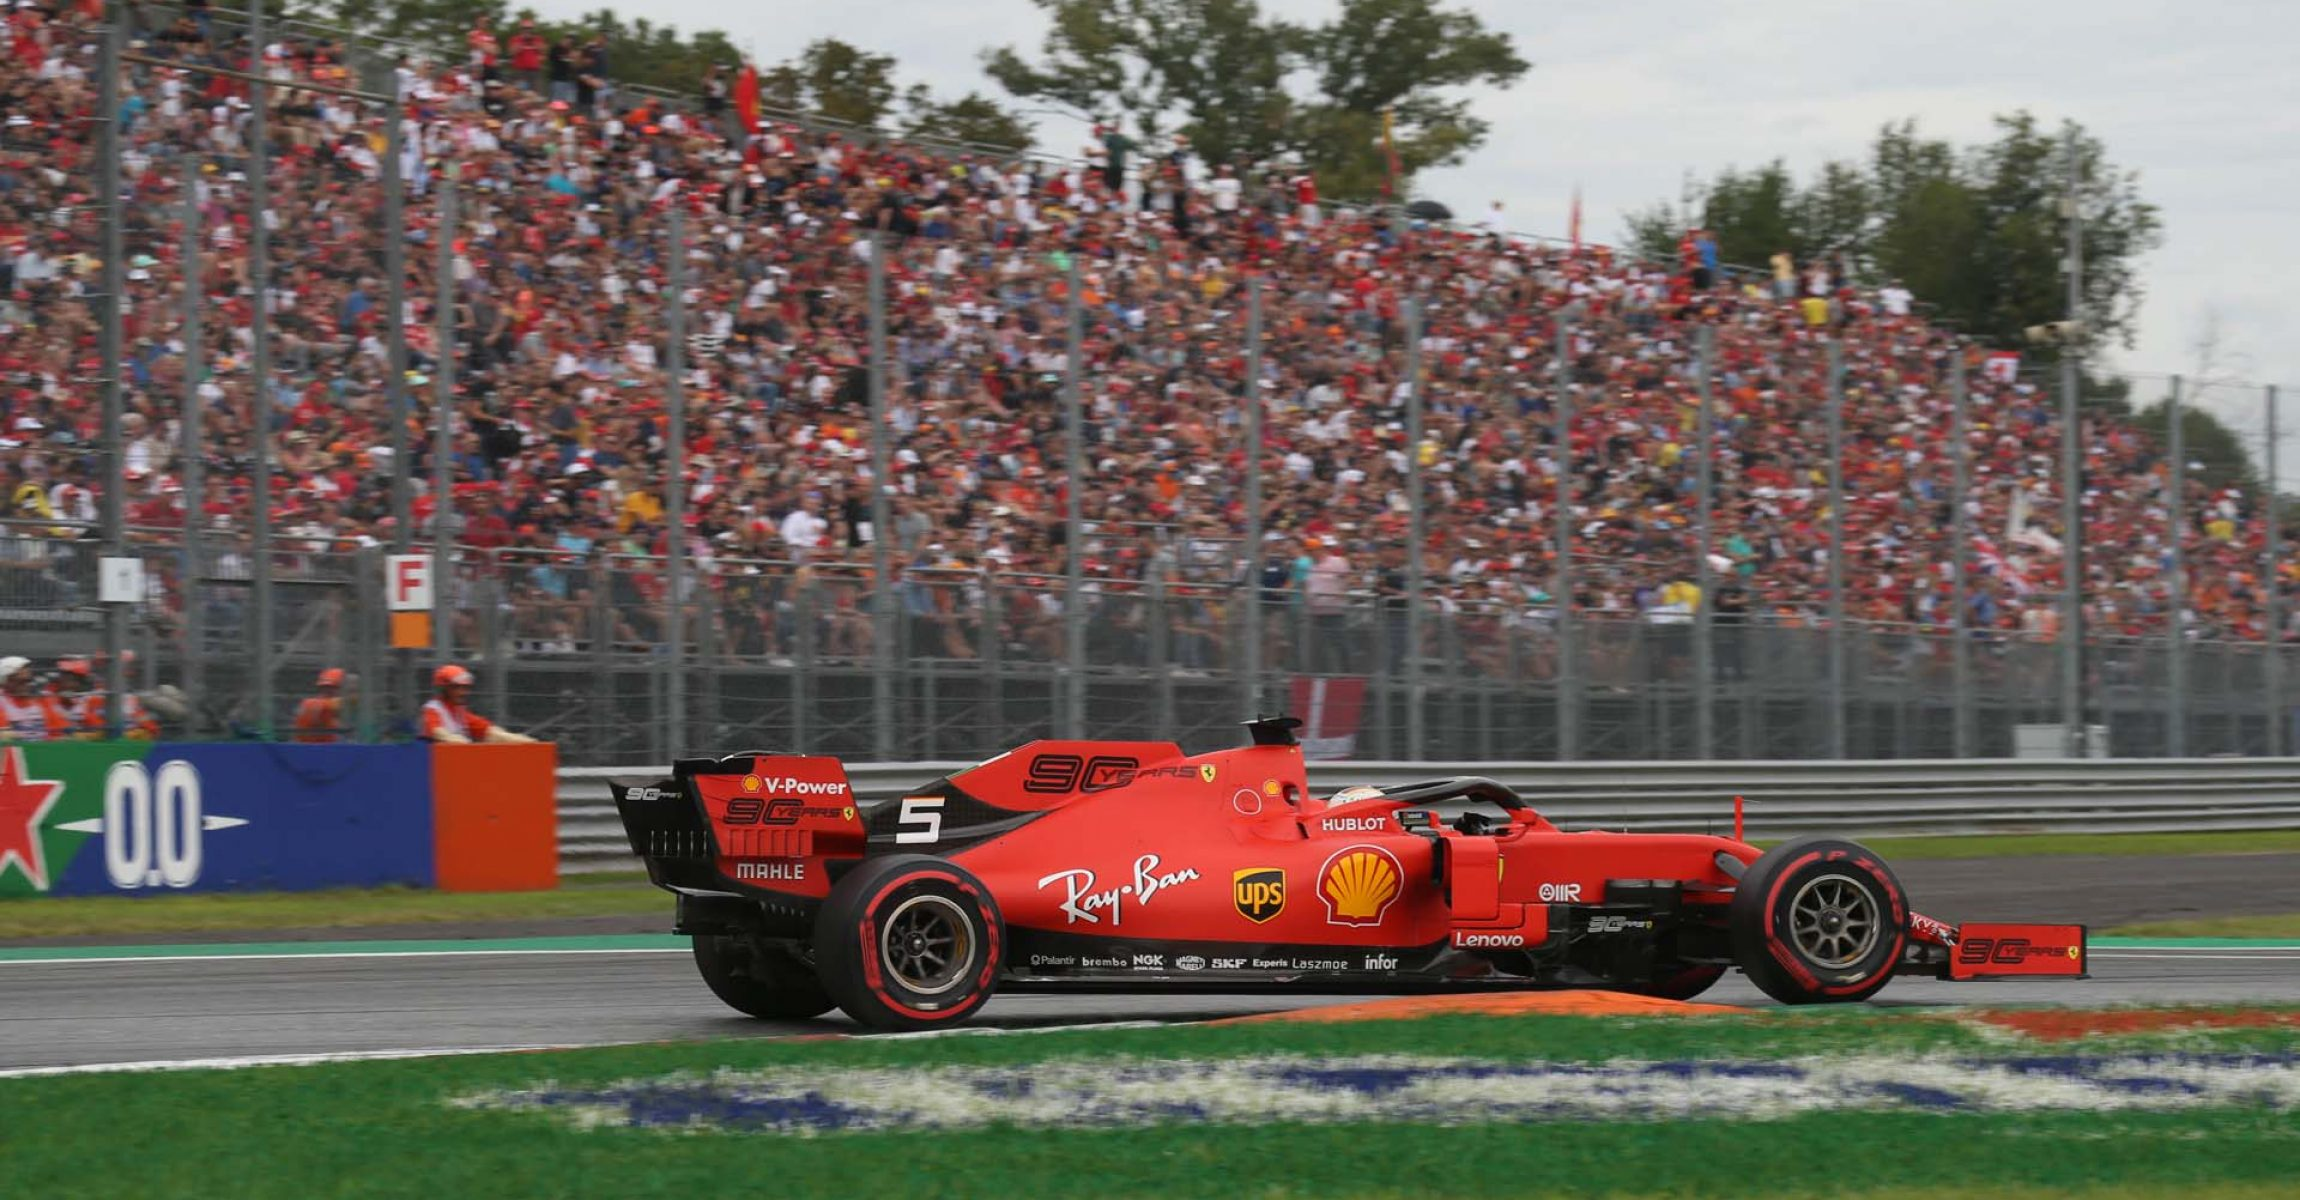 Sebastian Vettel, Ferrari, Italian Grand Prix 2019, Monza, Saturday